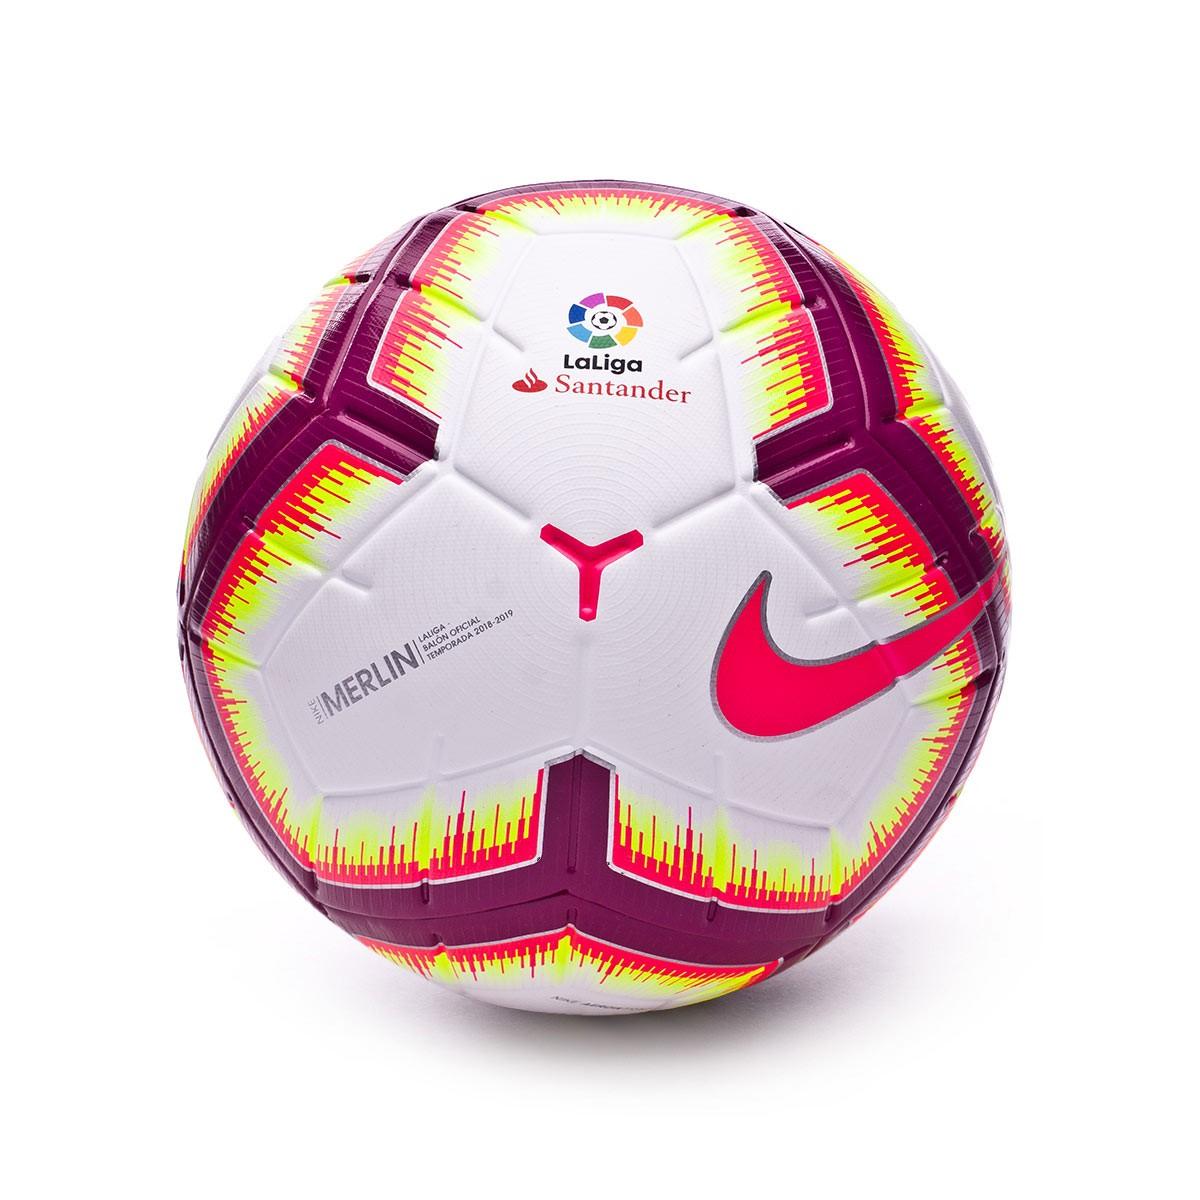 Ropa Sacrificio Escuchando  Ball Nike LaLiga Merlin 2018-2019 White-Pink flash-Team red - Football  store Fútbol Emotion